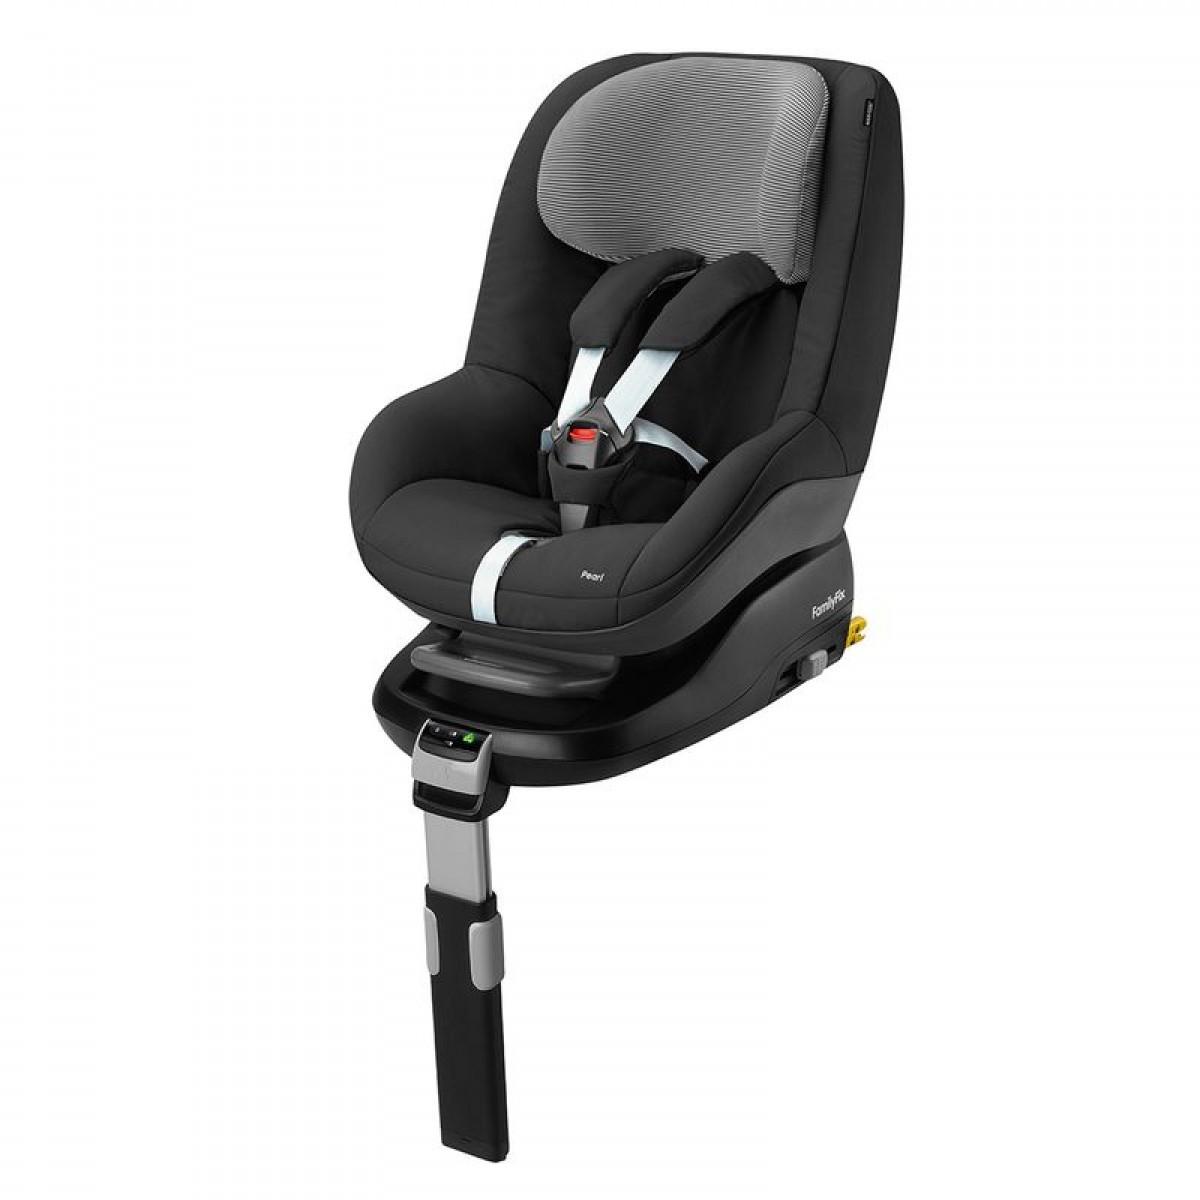 Maxi Cosi Black Raven Car Seat